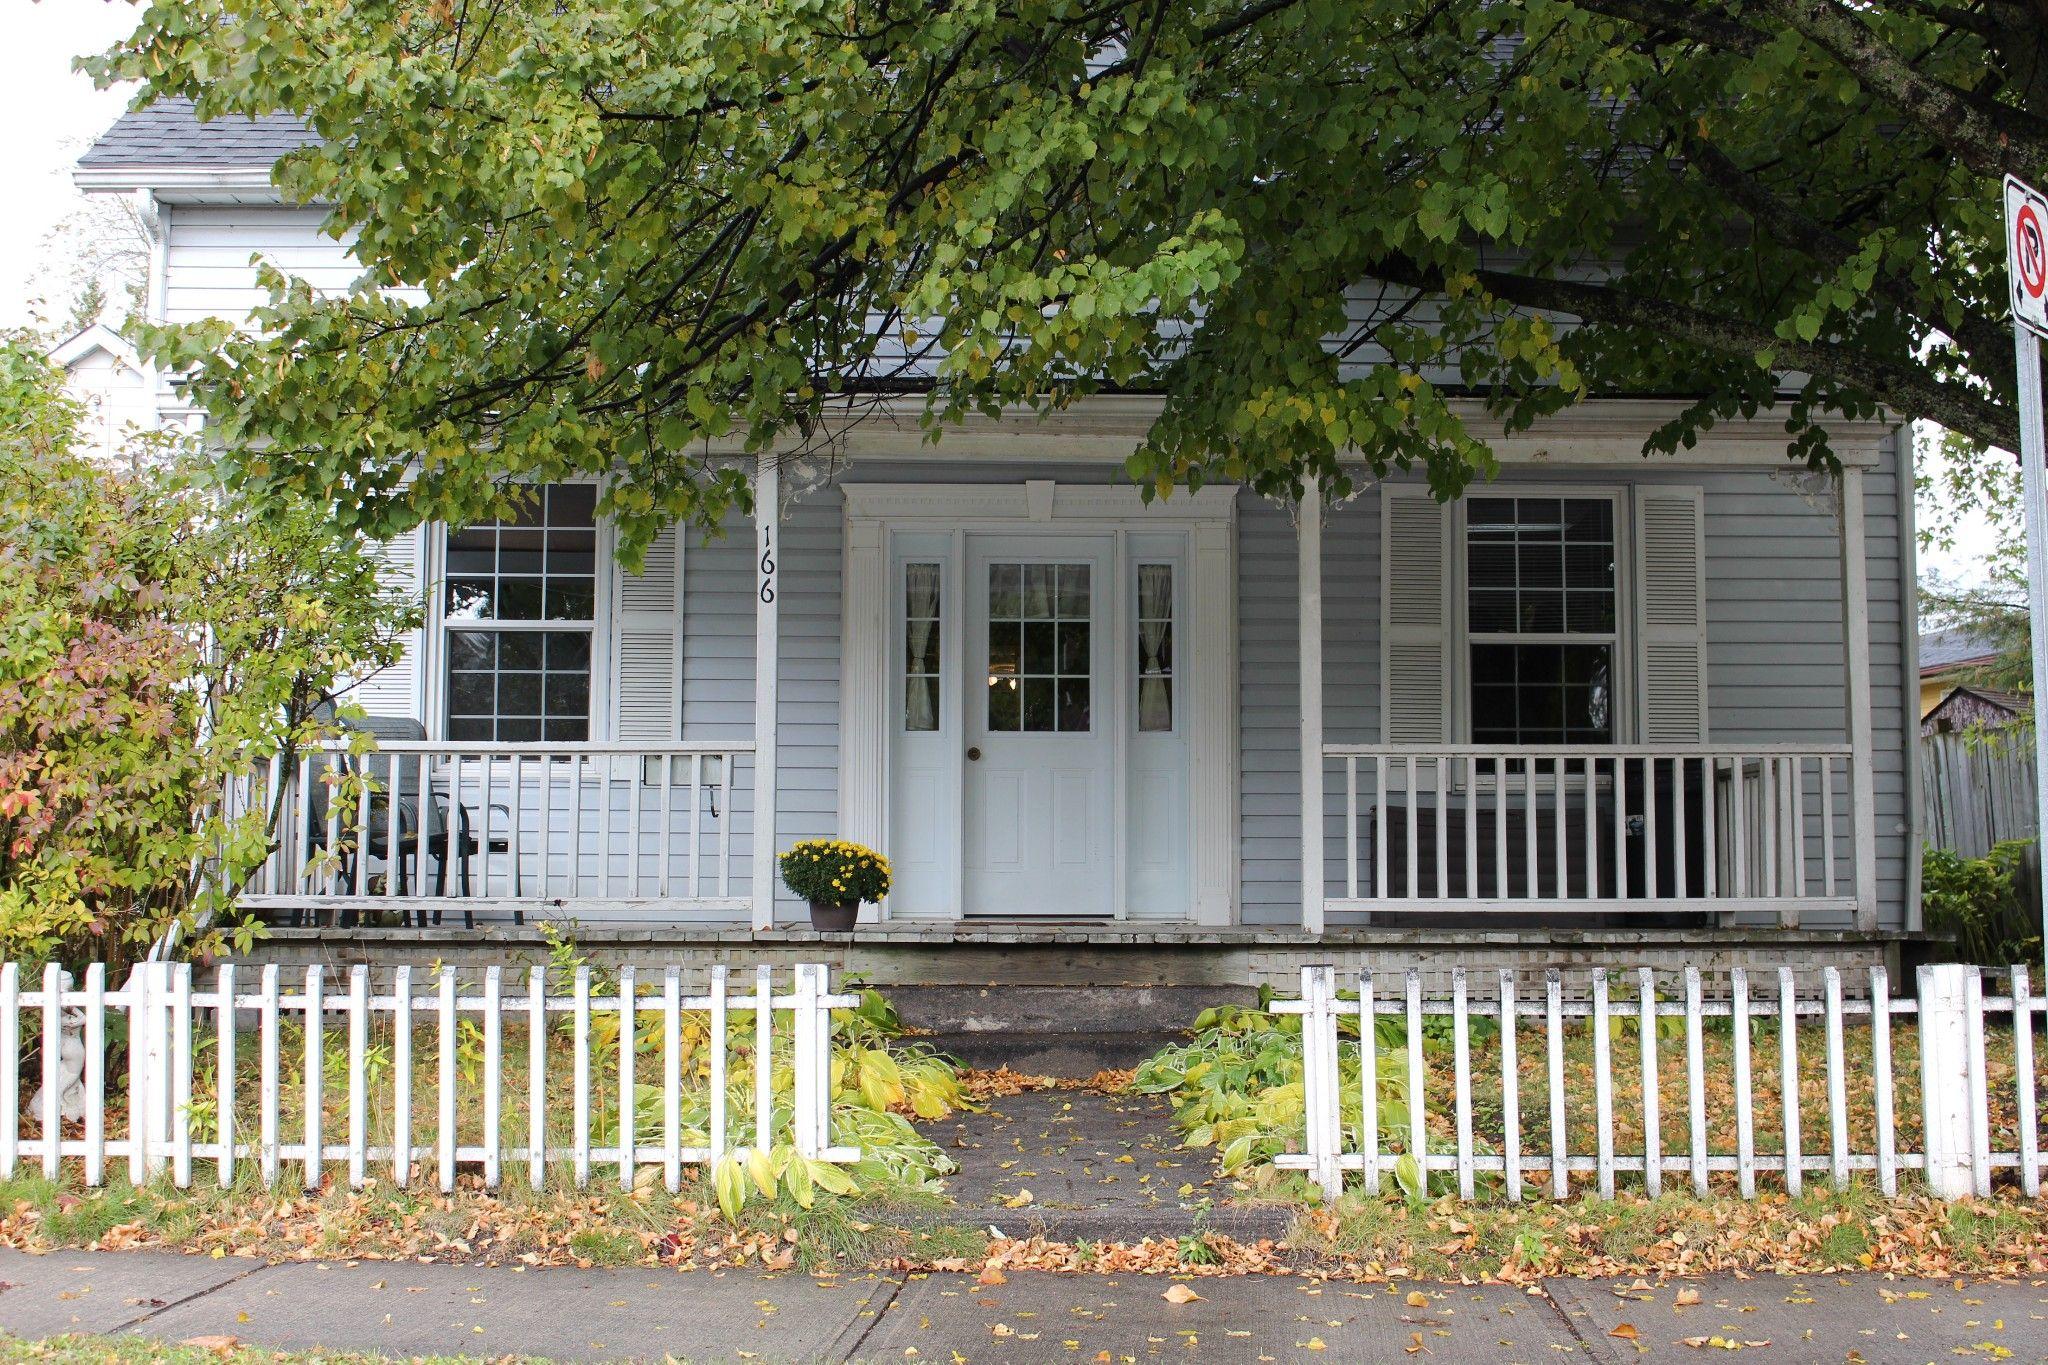 Main Photo: 166 Sydenham Street in Cobourg: House for sale : MLS®# 1602024